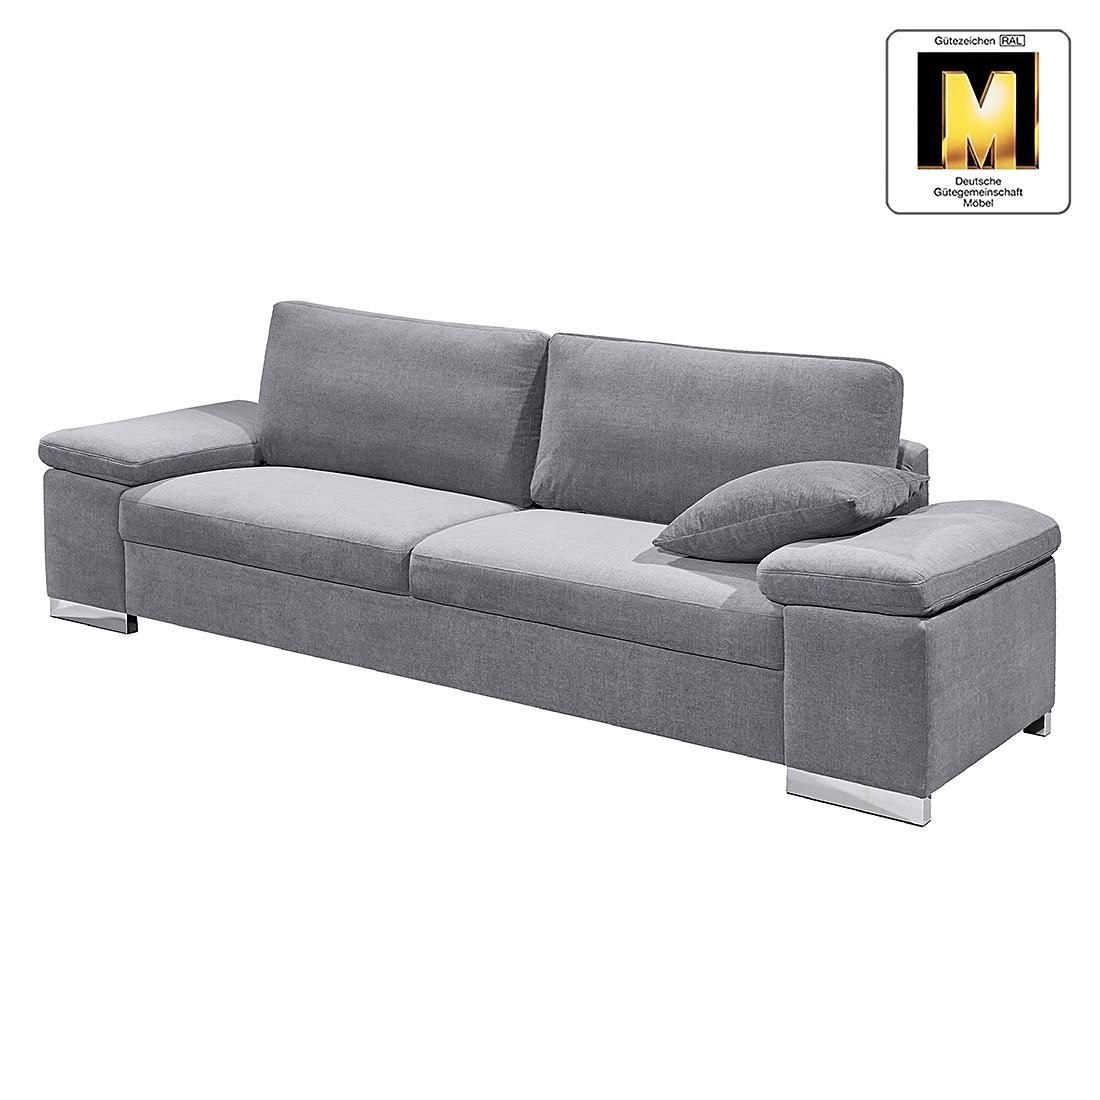 Sofa Casual Line V (3-Sitzer) – Velours – Silbergrau, Claas Claasen jetzt bestellen